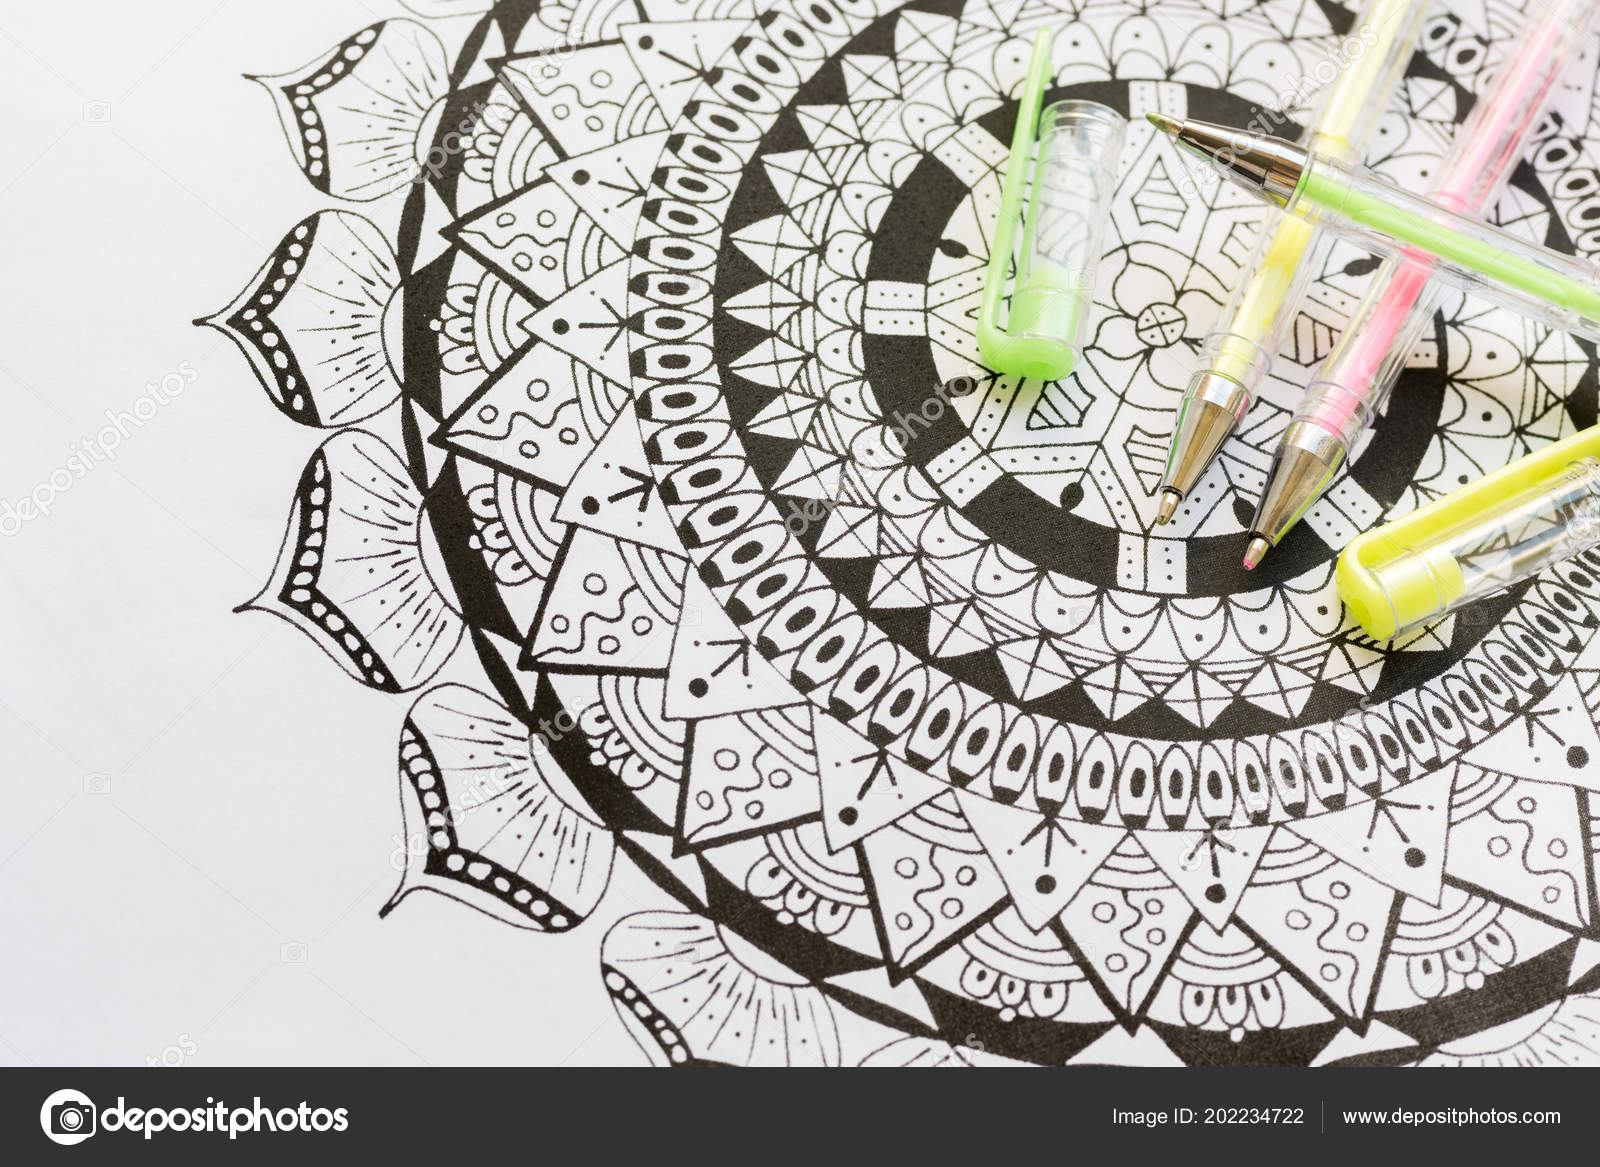 Coloriage Adulte Therapie.Livre Coloriage Adulte Nouveau Stress Relaxation Tendance Art